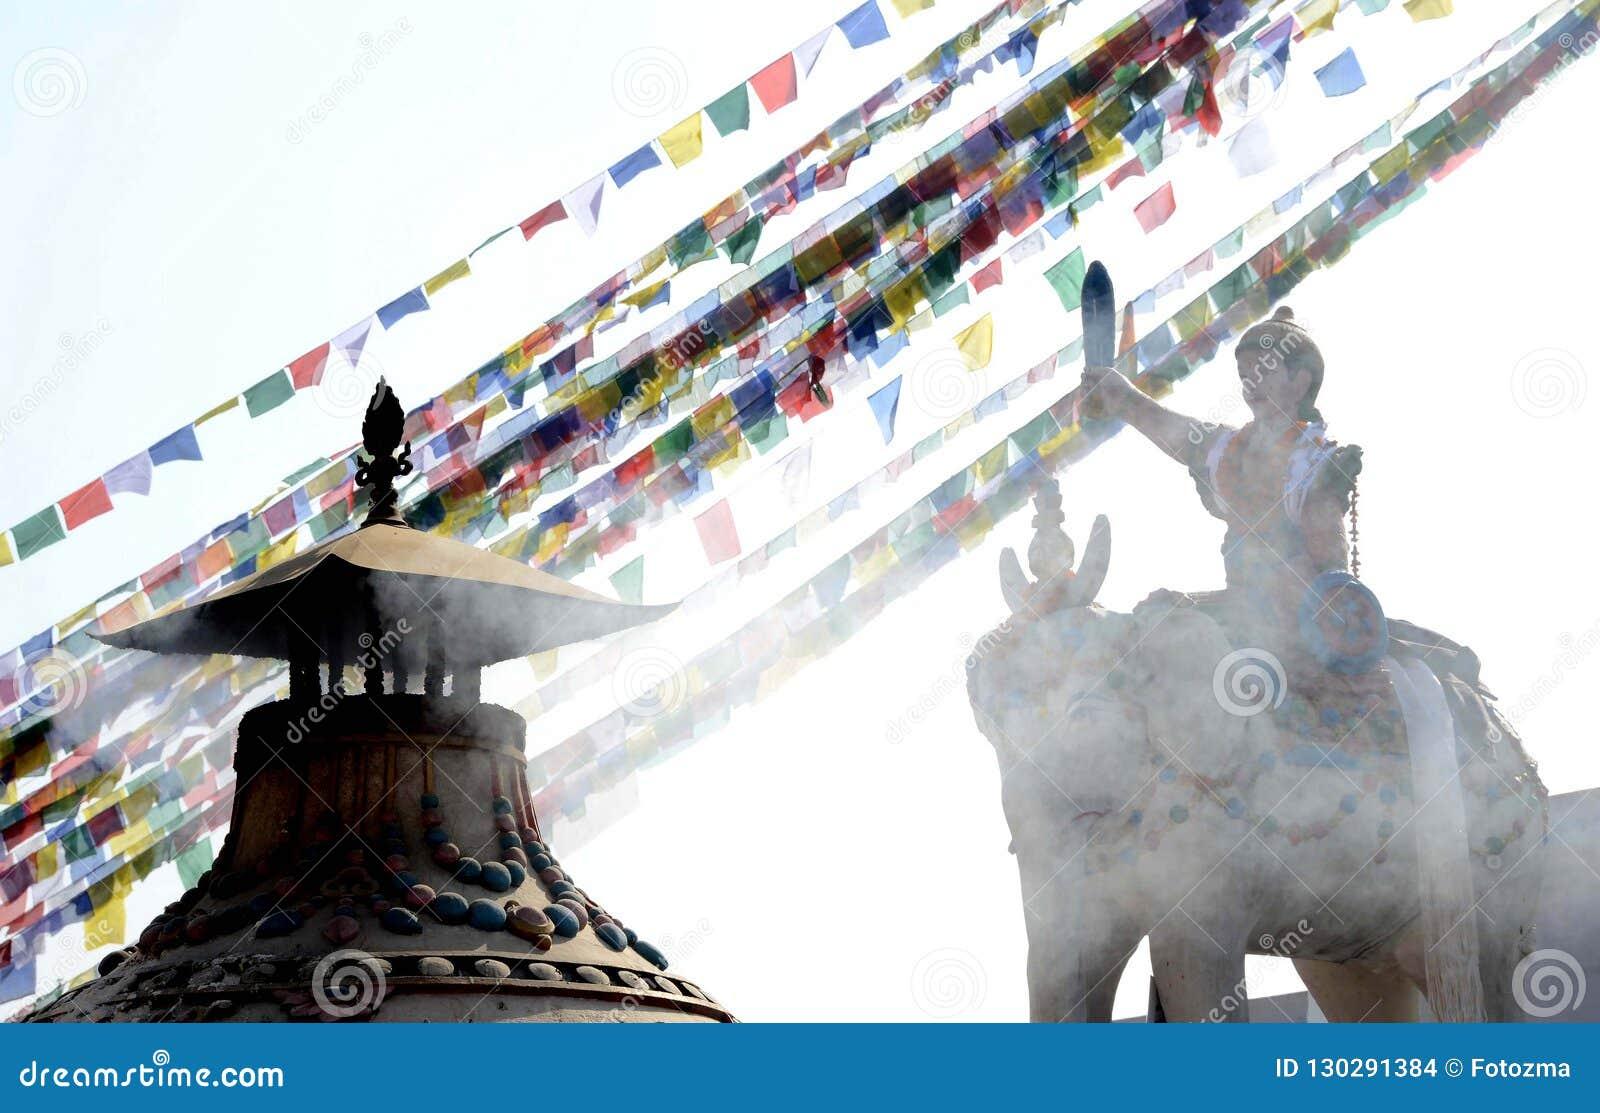 Estátua e bandeiras em Boudhanath Stupa Kathmandu